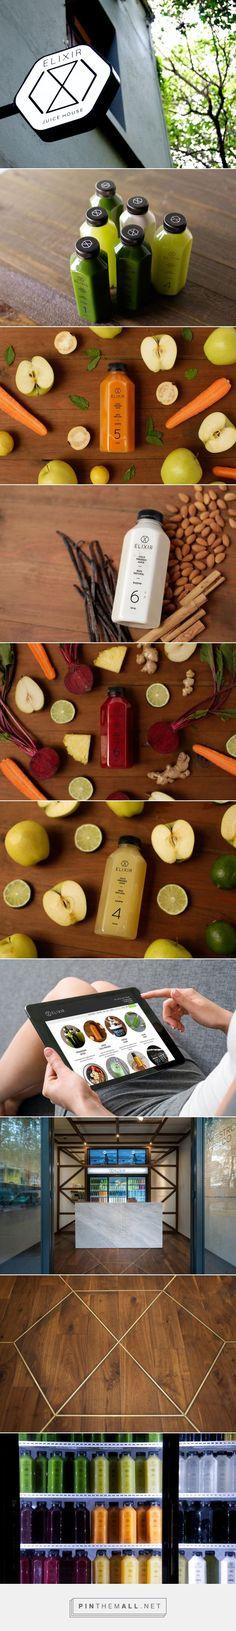 ELIXIR DETOX Juice Branding and Packaging by DBM Studio | Fivestar Branding Agency – Design and Branding Agency & Curated Inspiration Gallery